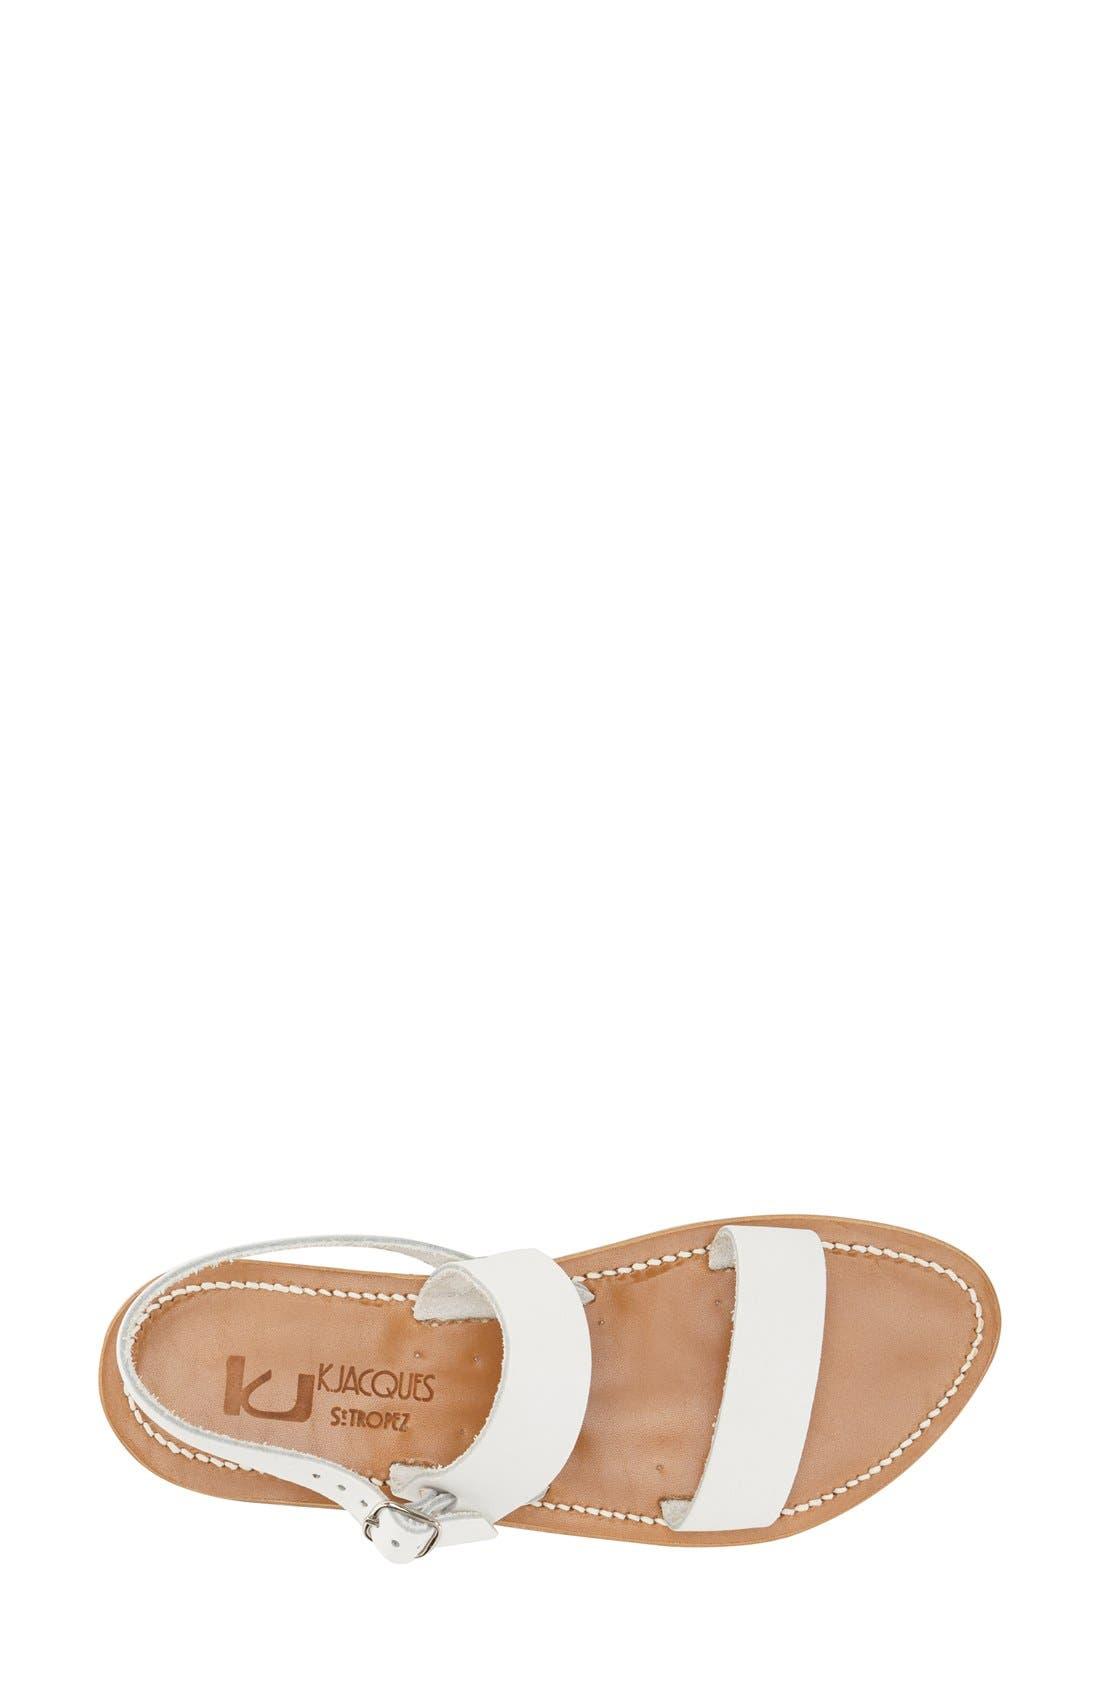 Alternate Image 3  - K Jacques St. Tropez Flat 'Barigoule' Vachetta Leather Sandal